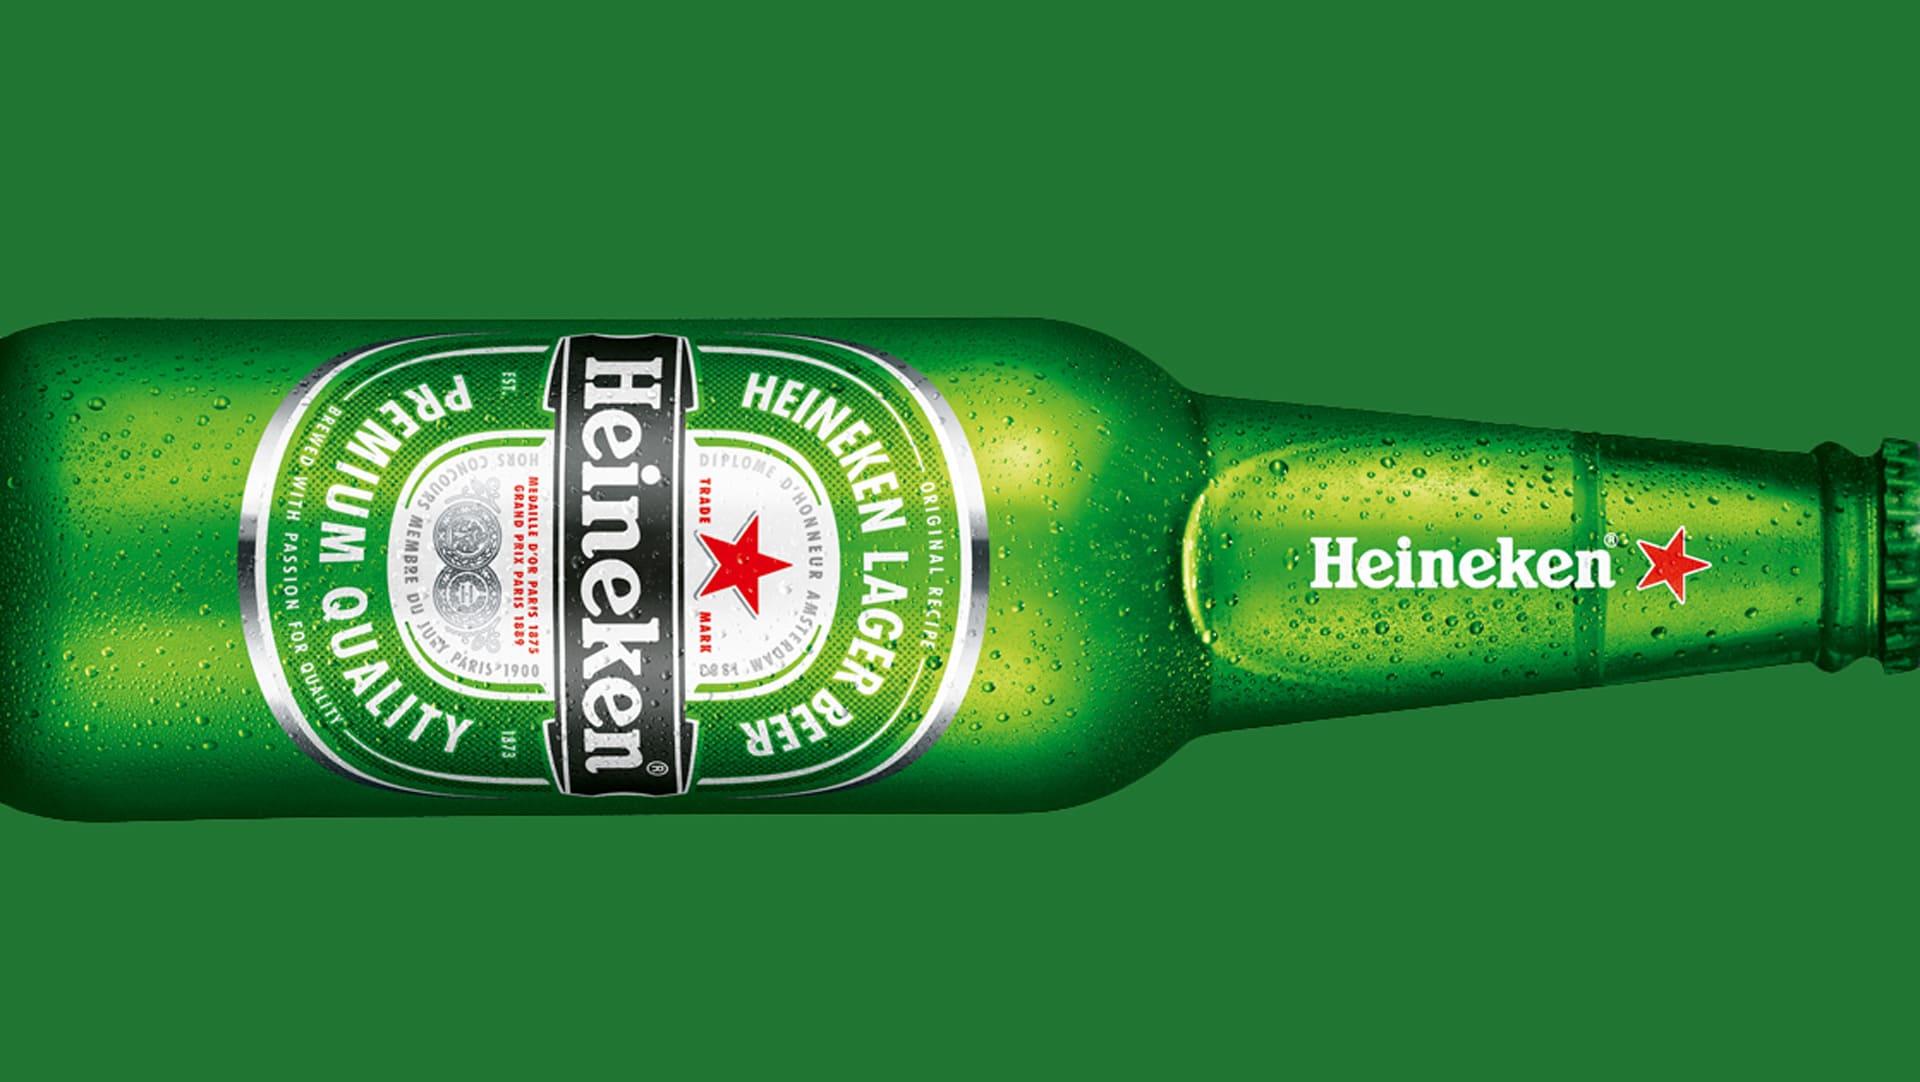 Green Heineken bottle laid horizontally on a green background.